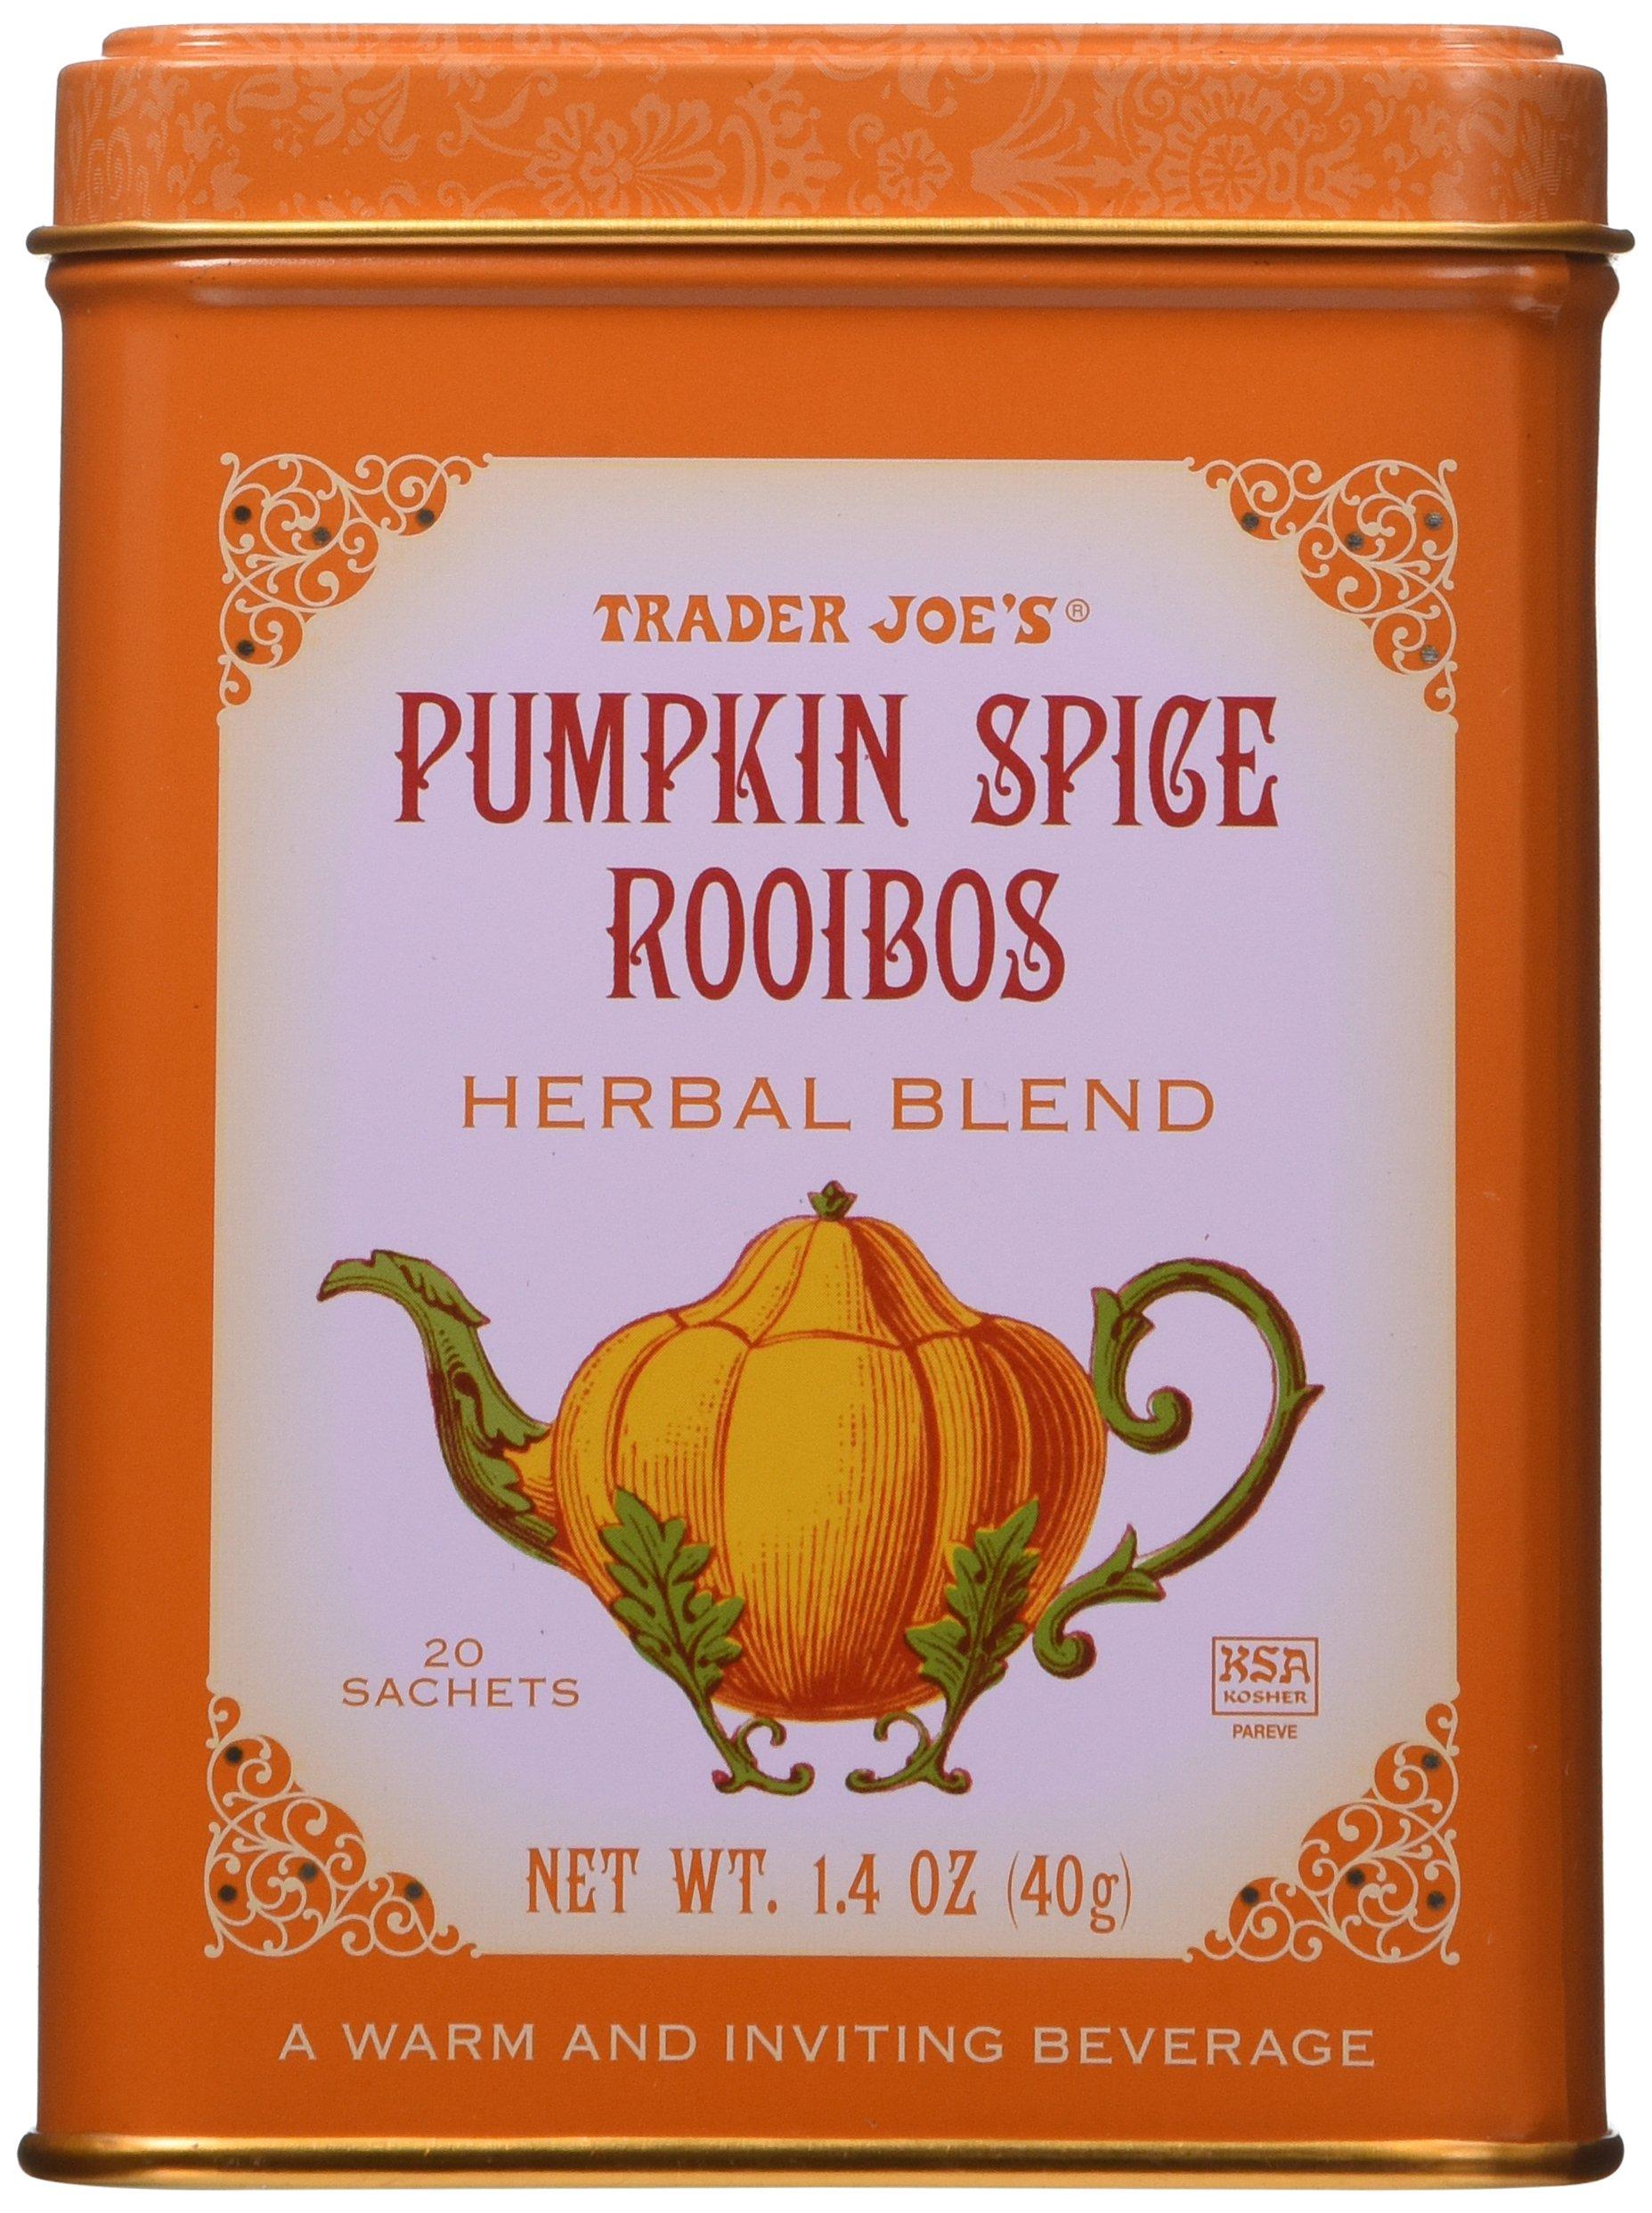 Trader Joe's Pumpkin Spice Rooibos Herbal Blend Beverage 20 sachets by Trader Joe's